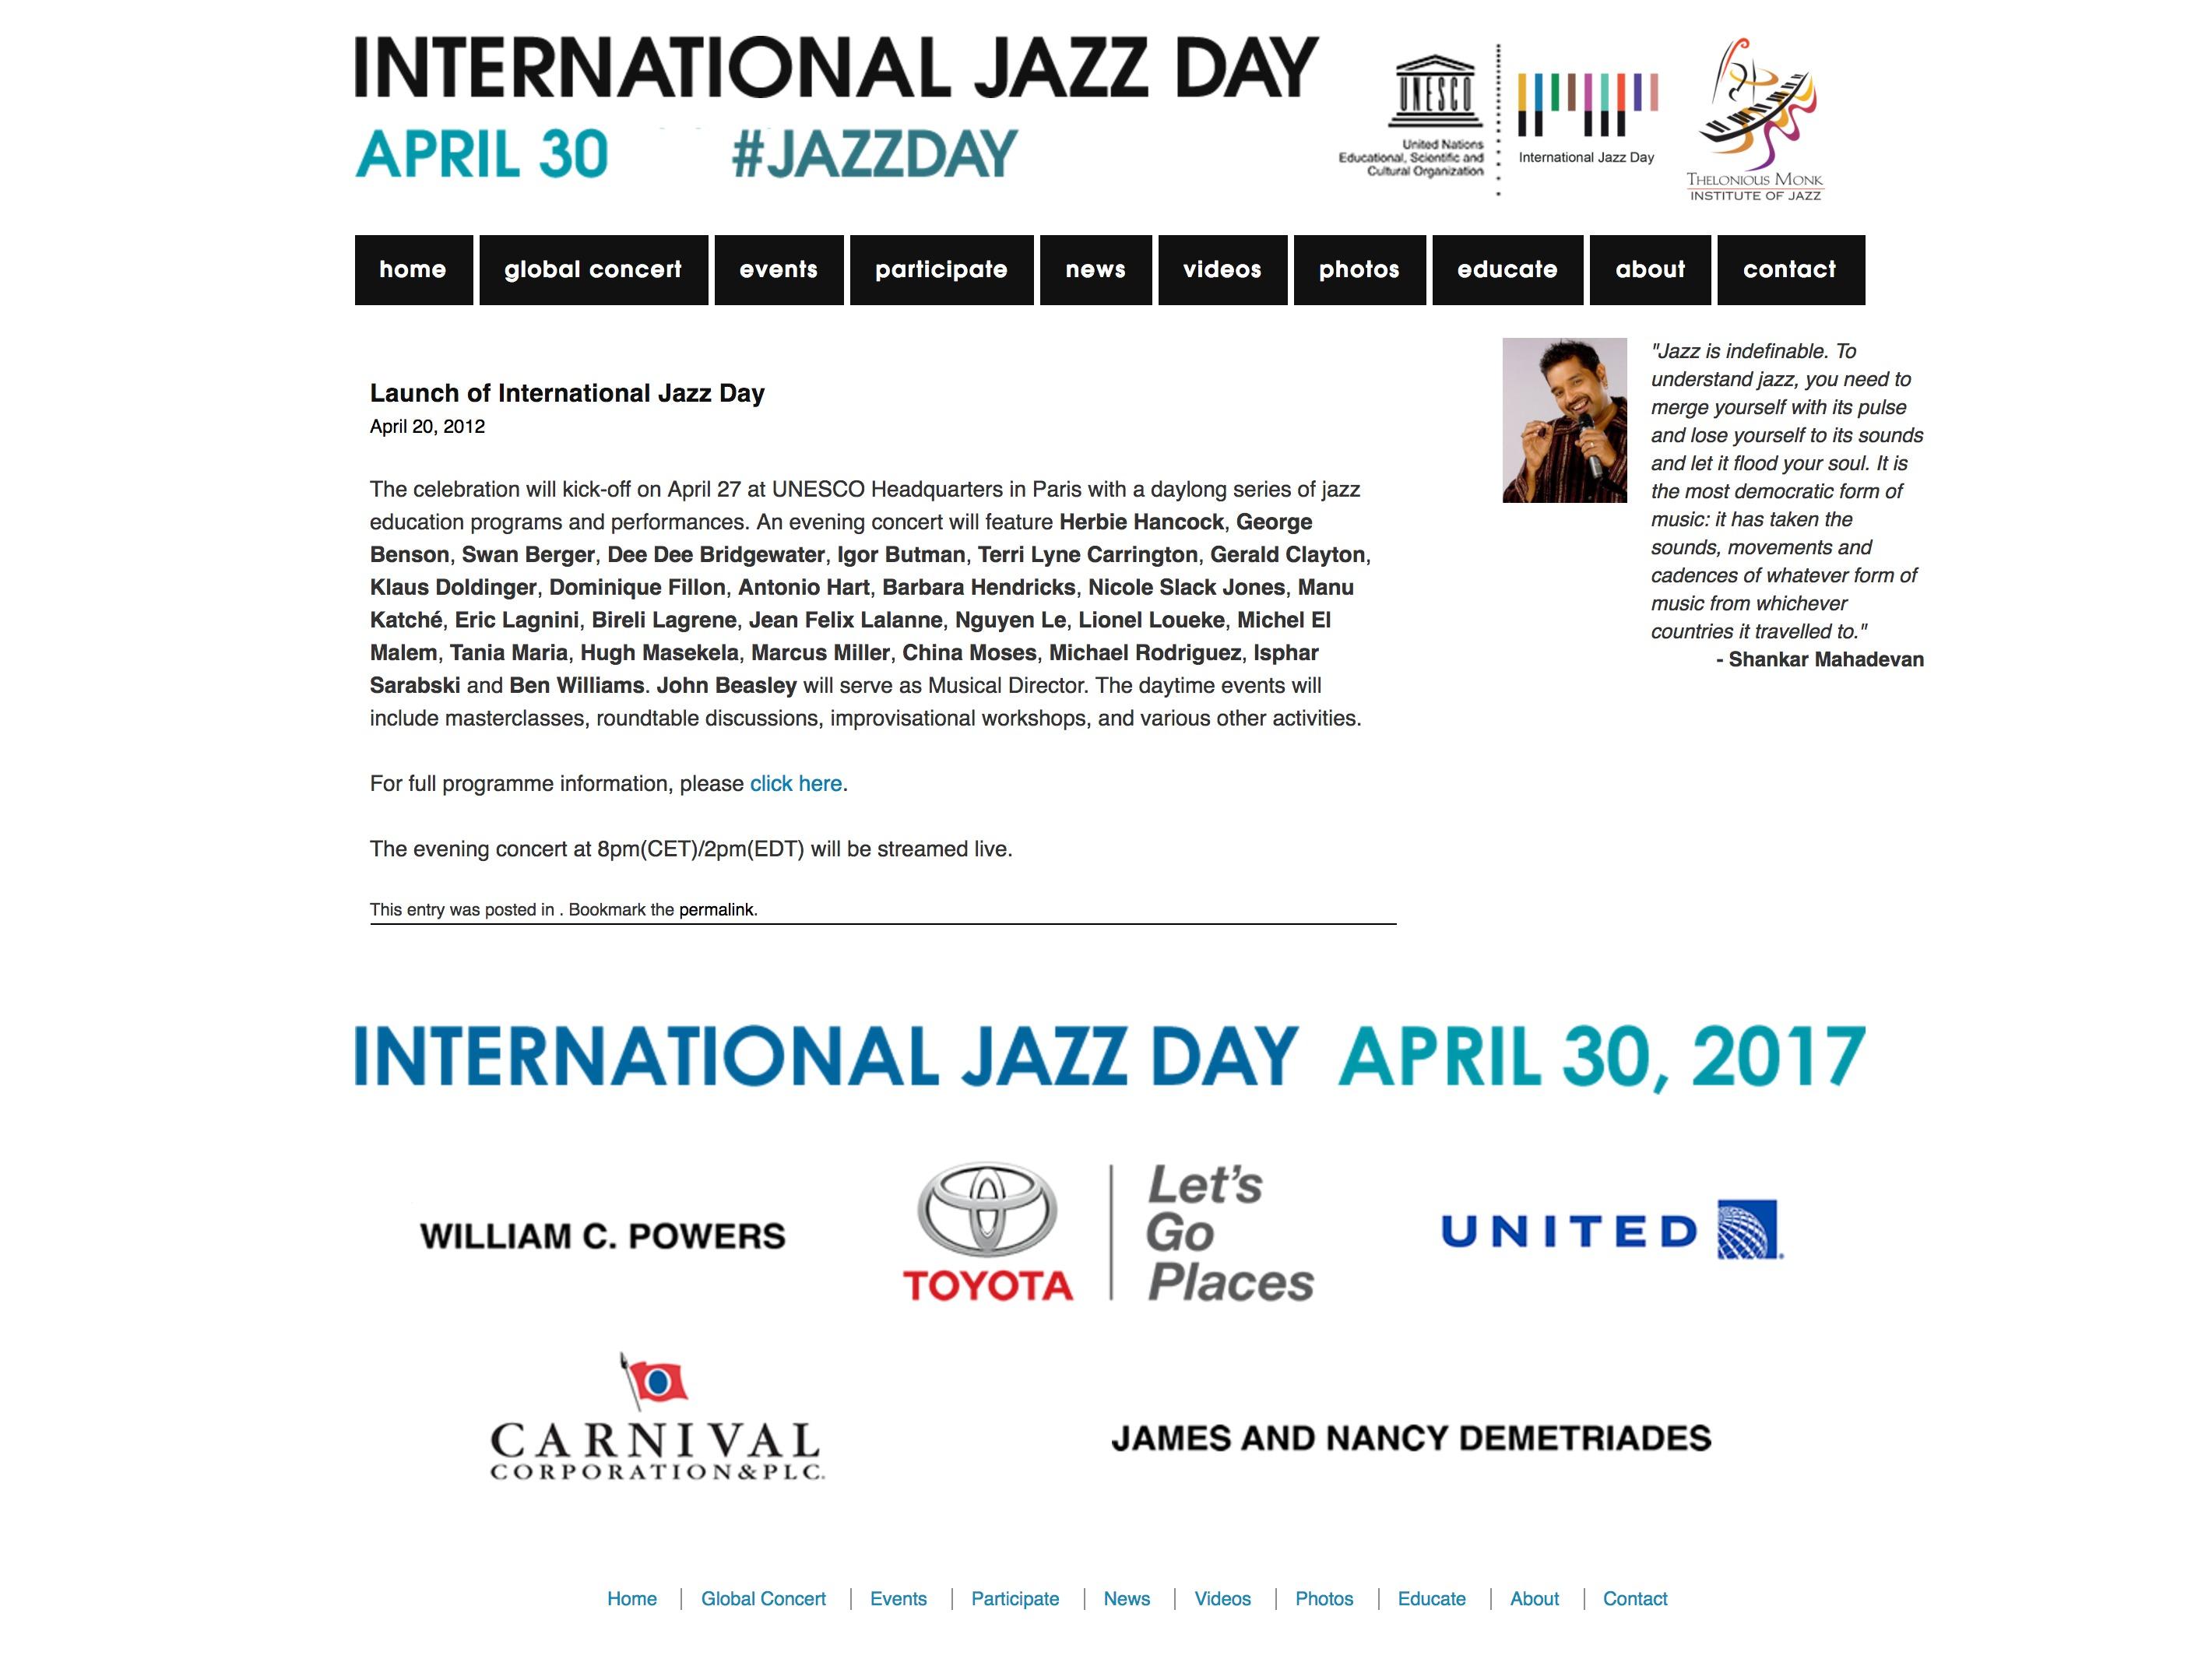 INTERNATIONAL JAZZ DAY - UNESCO